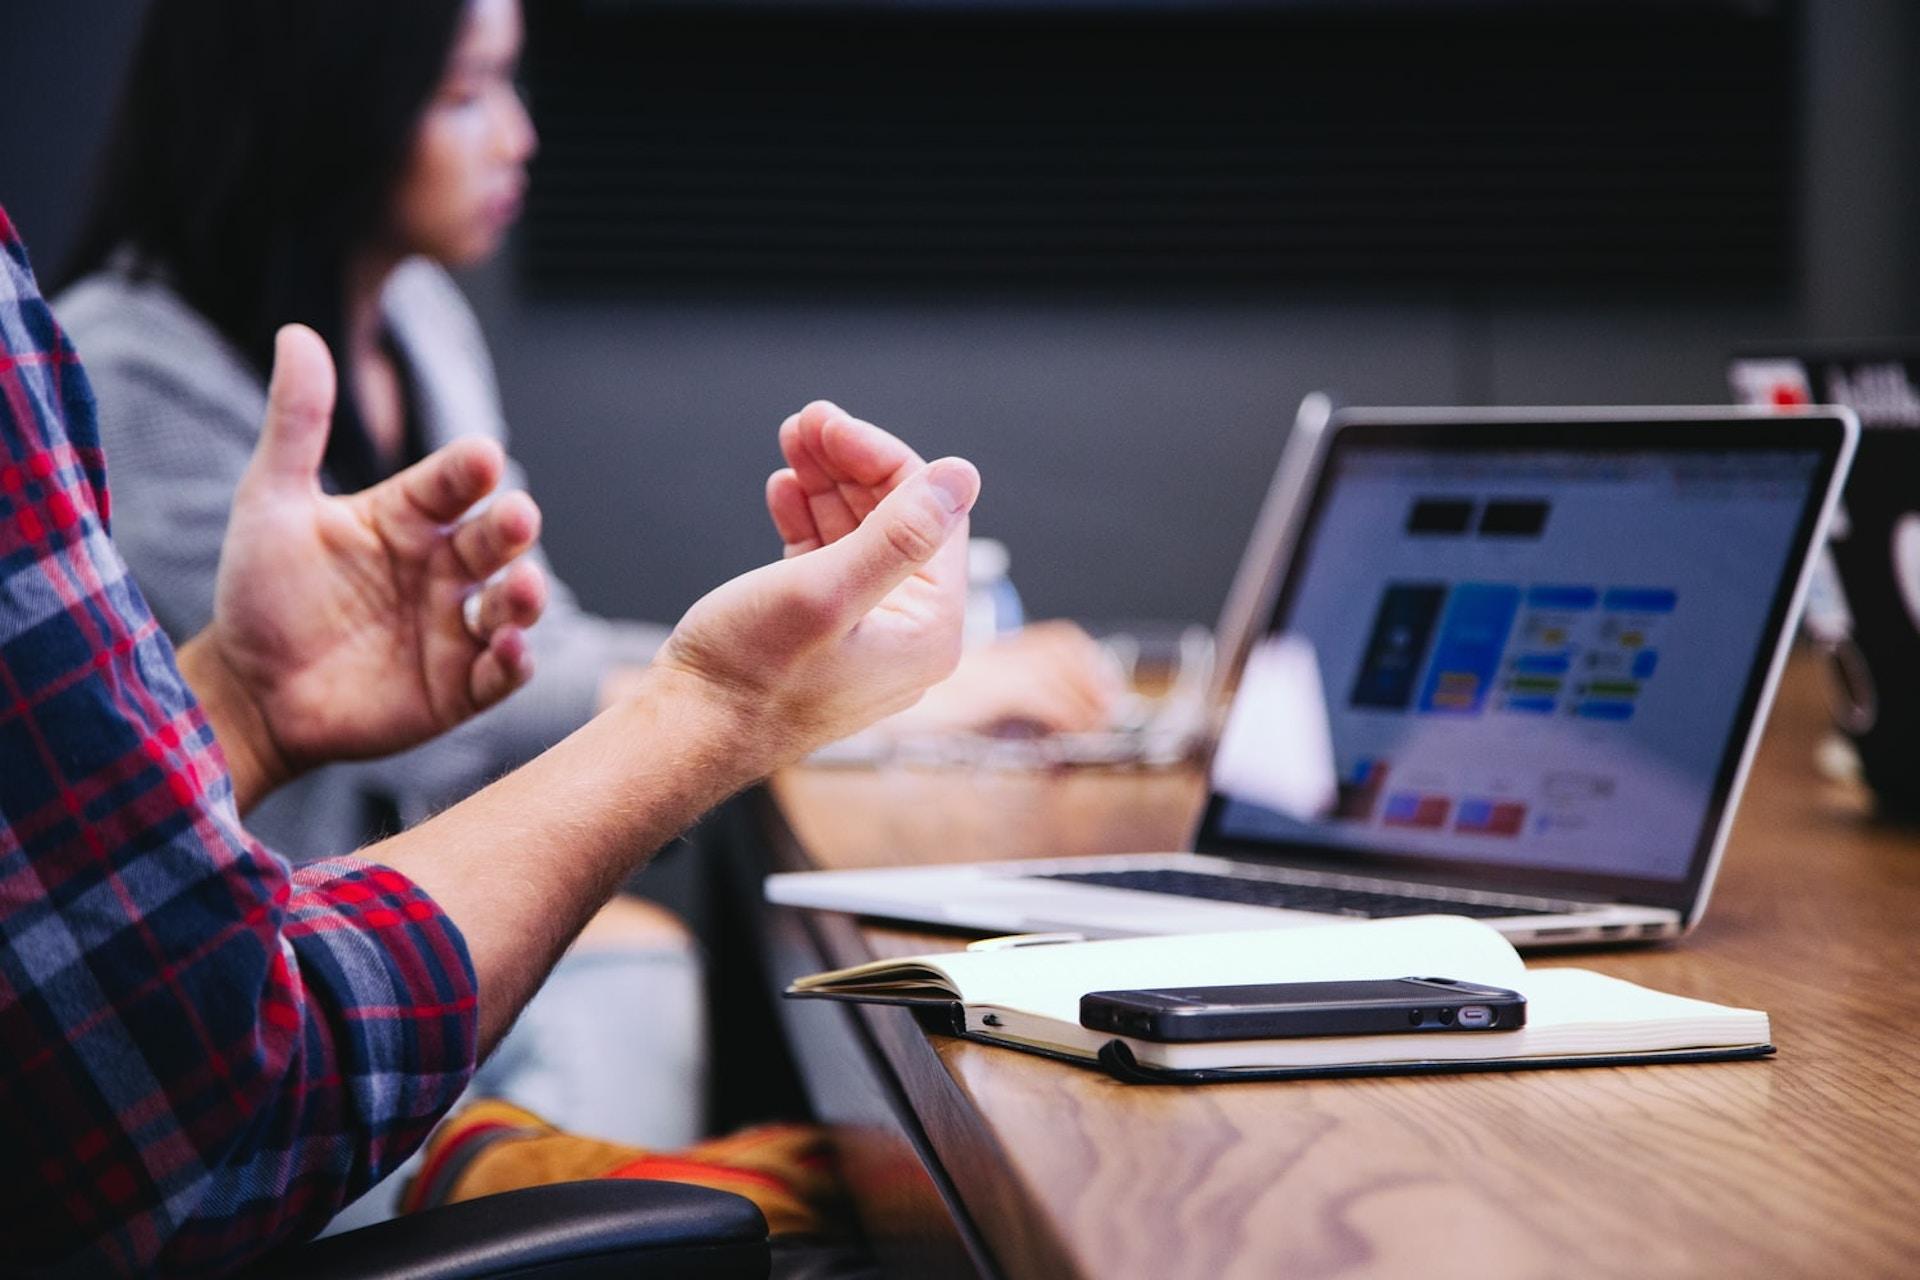 PR agency working laptop hand gesture